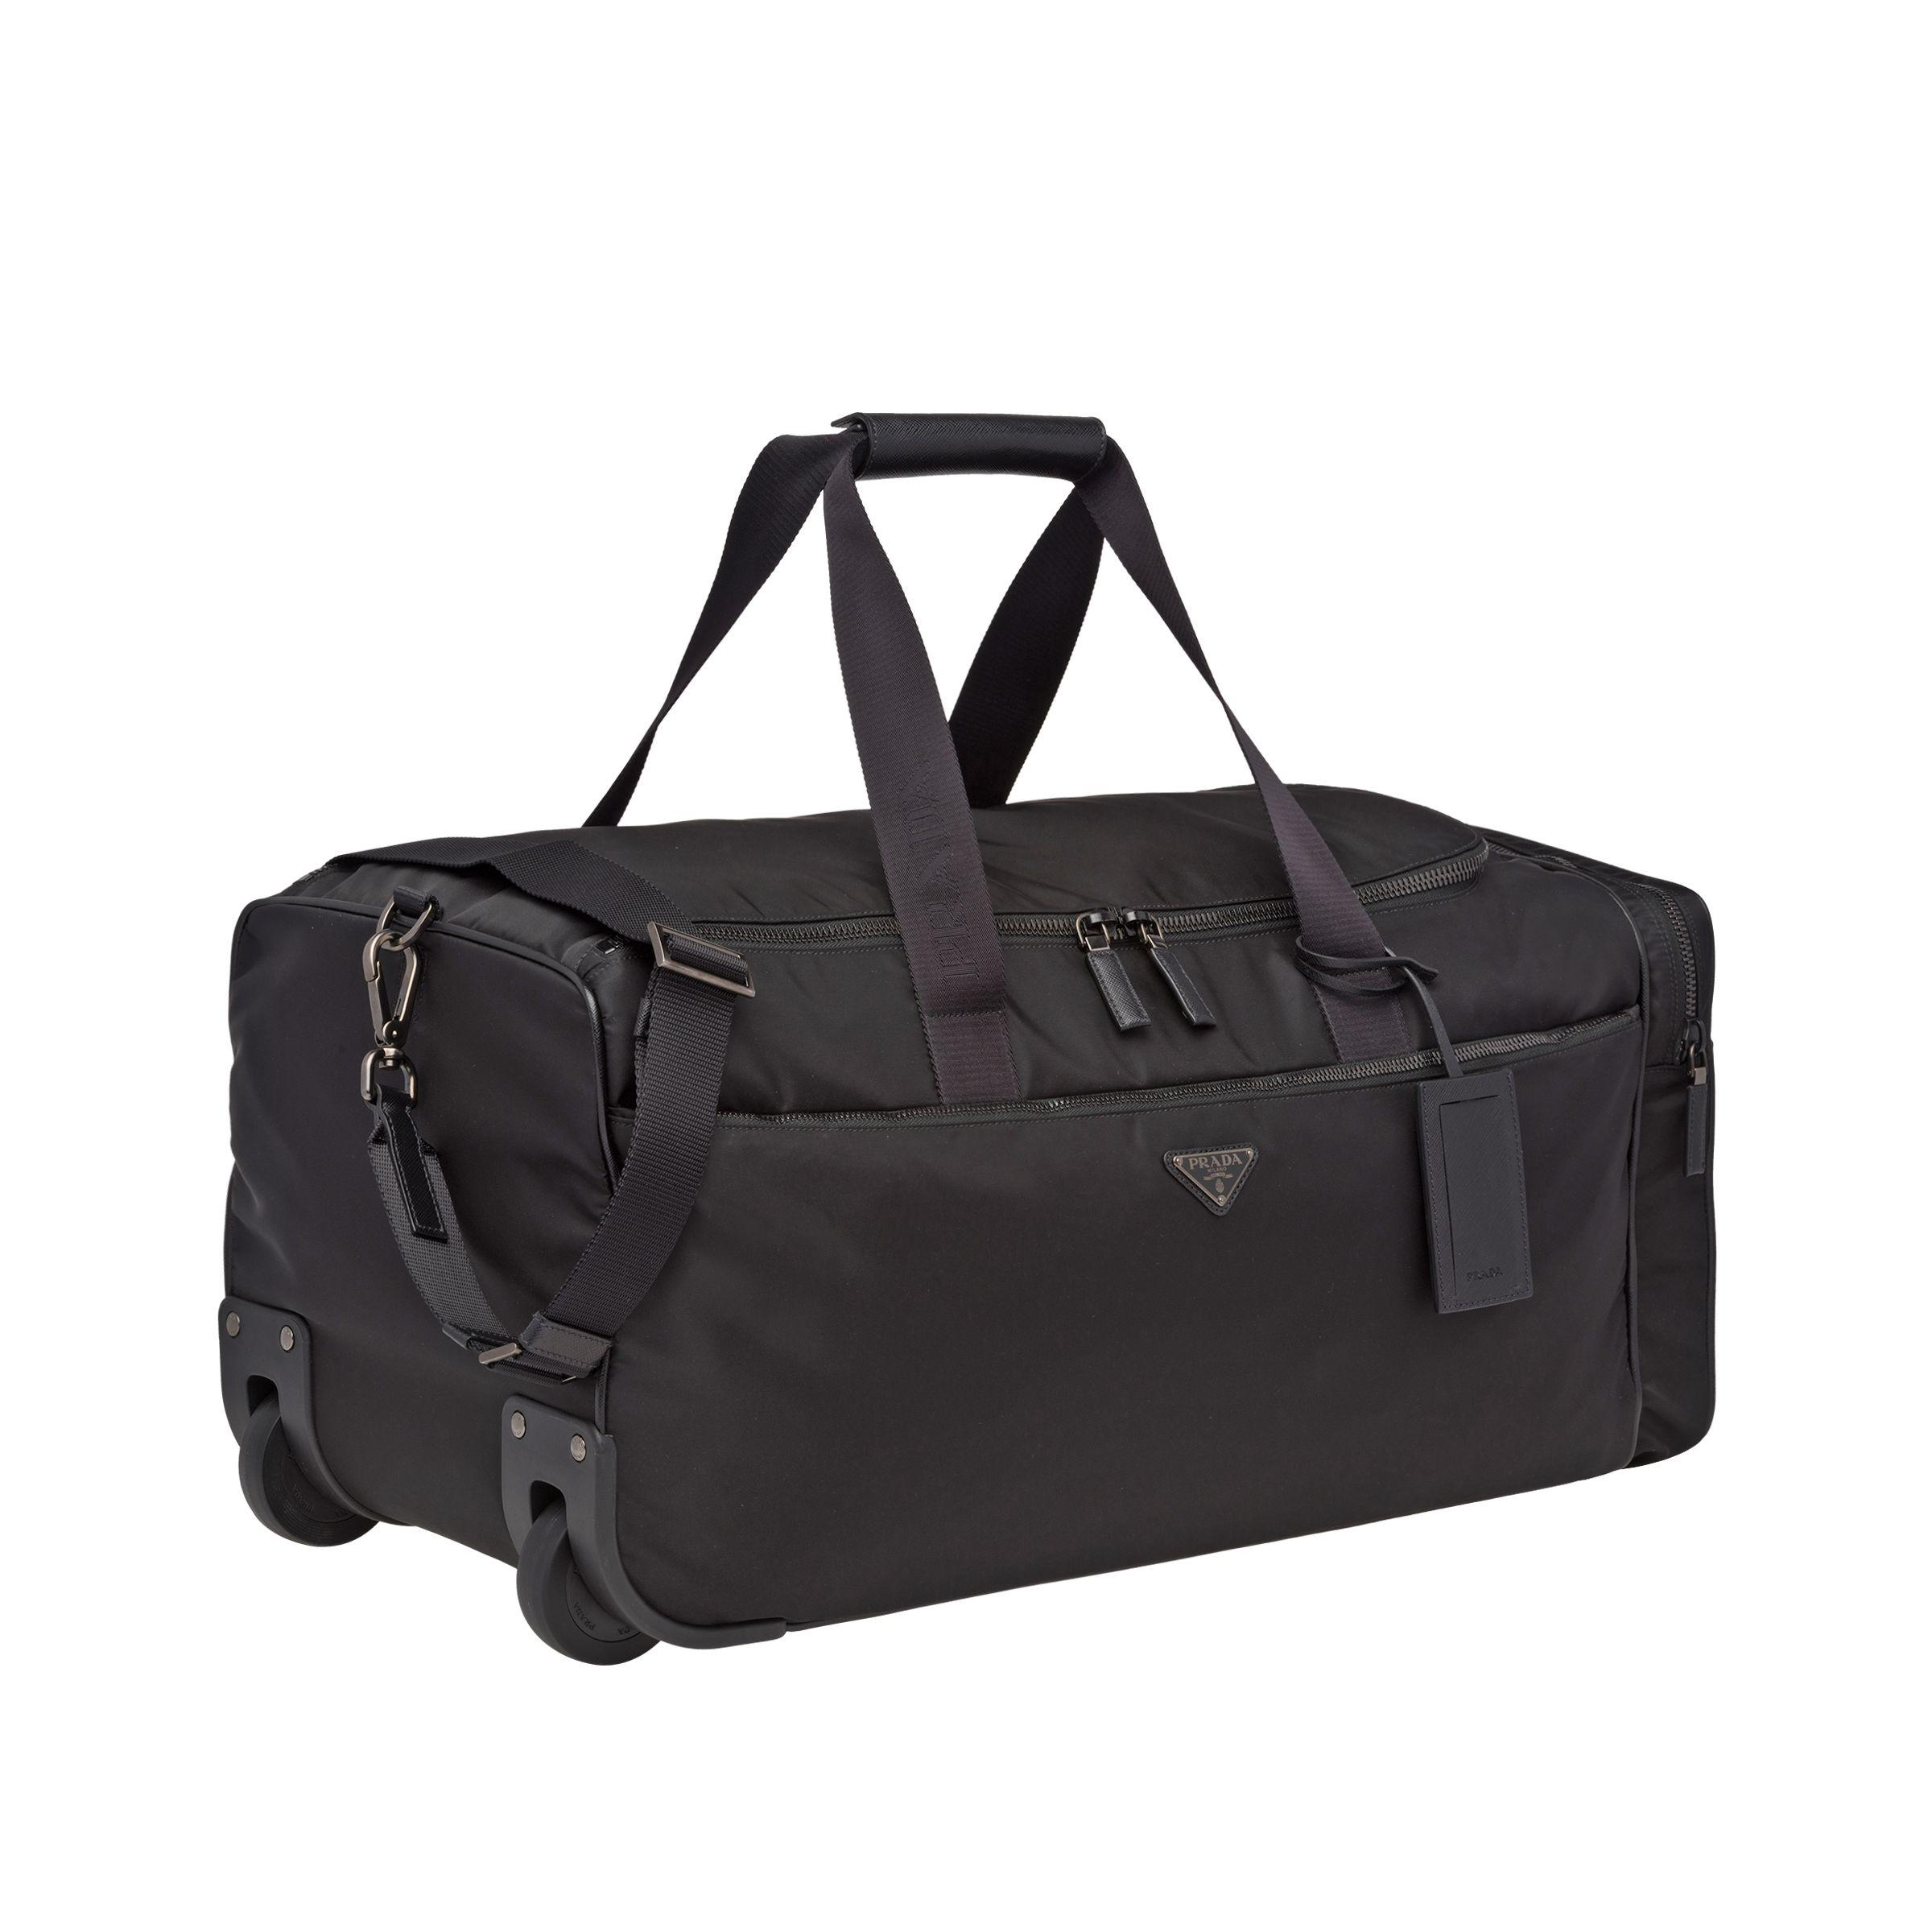 16e0f5a155e0 Lyst - Prada Nylon And Saffiano Leather Wheeled Carry-on in Black ...